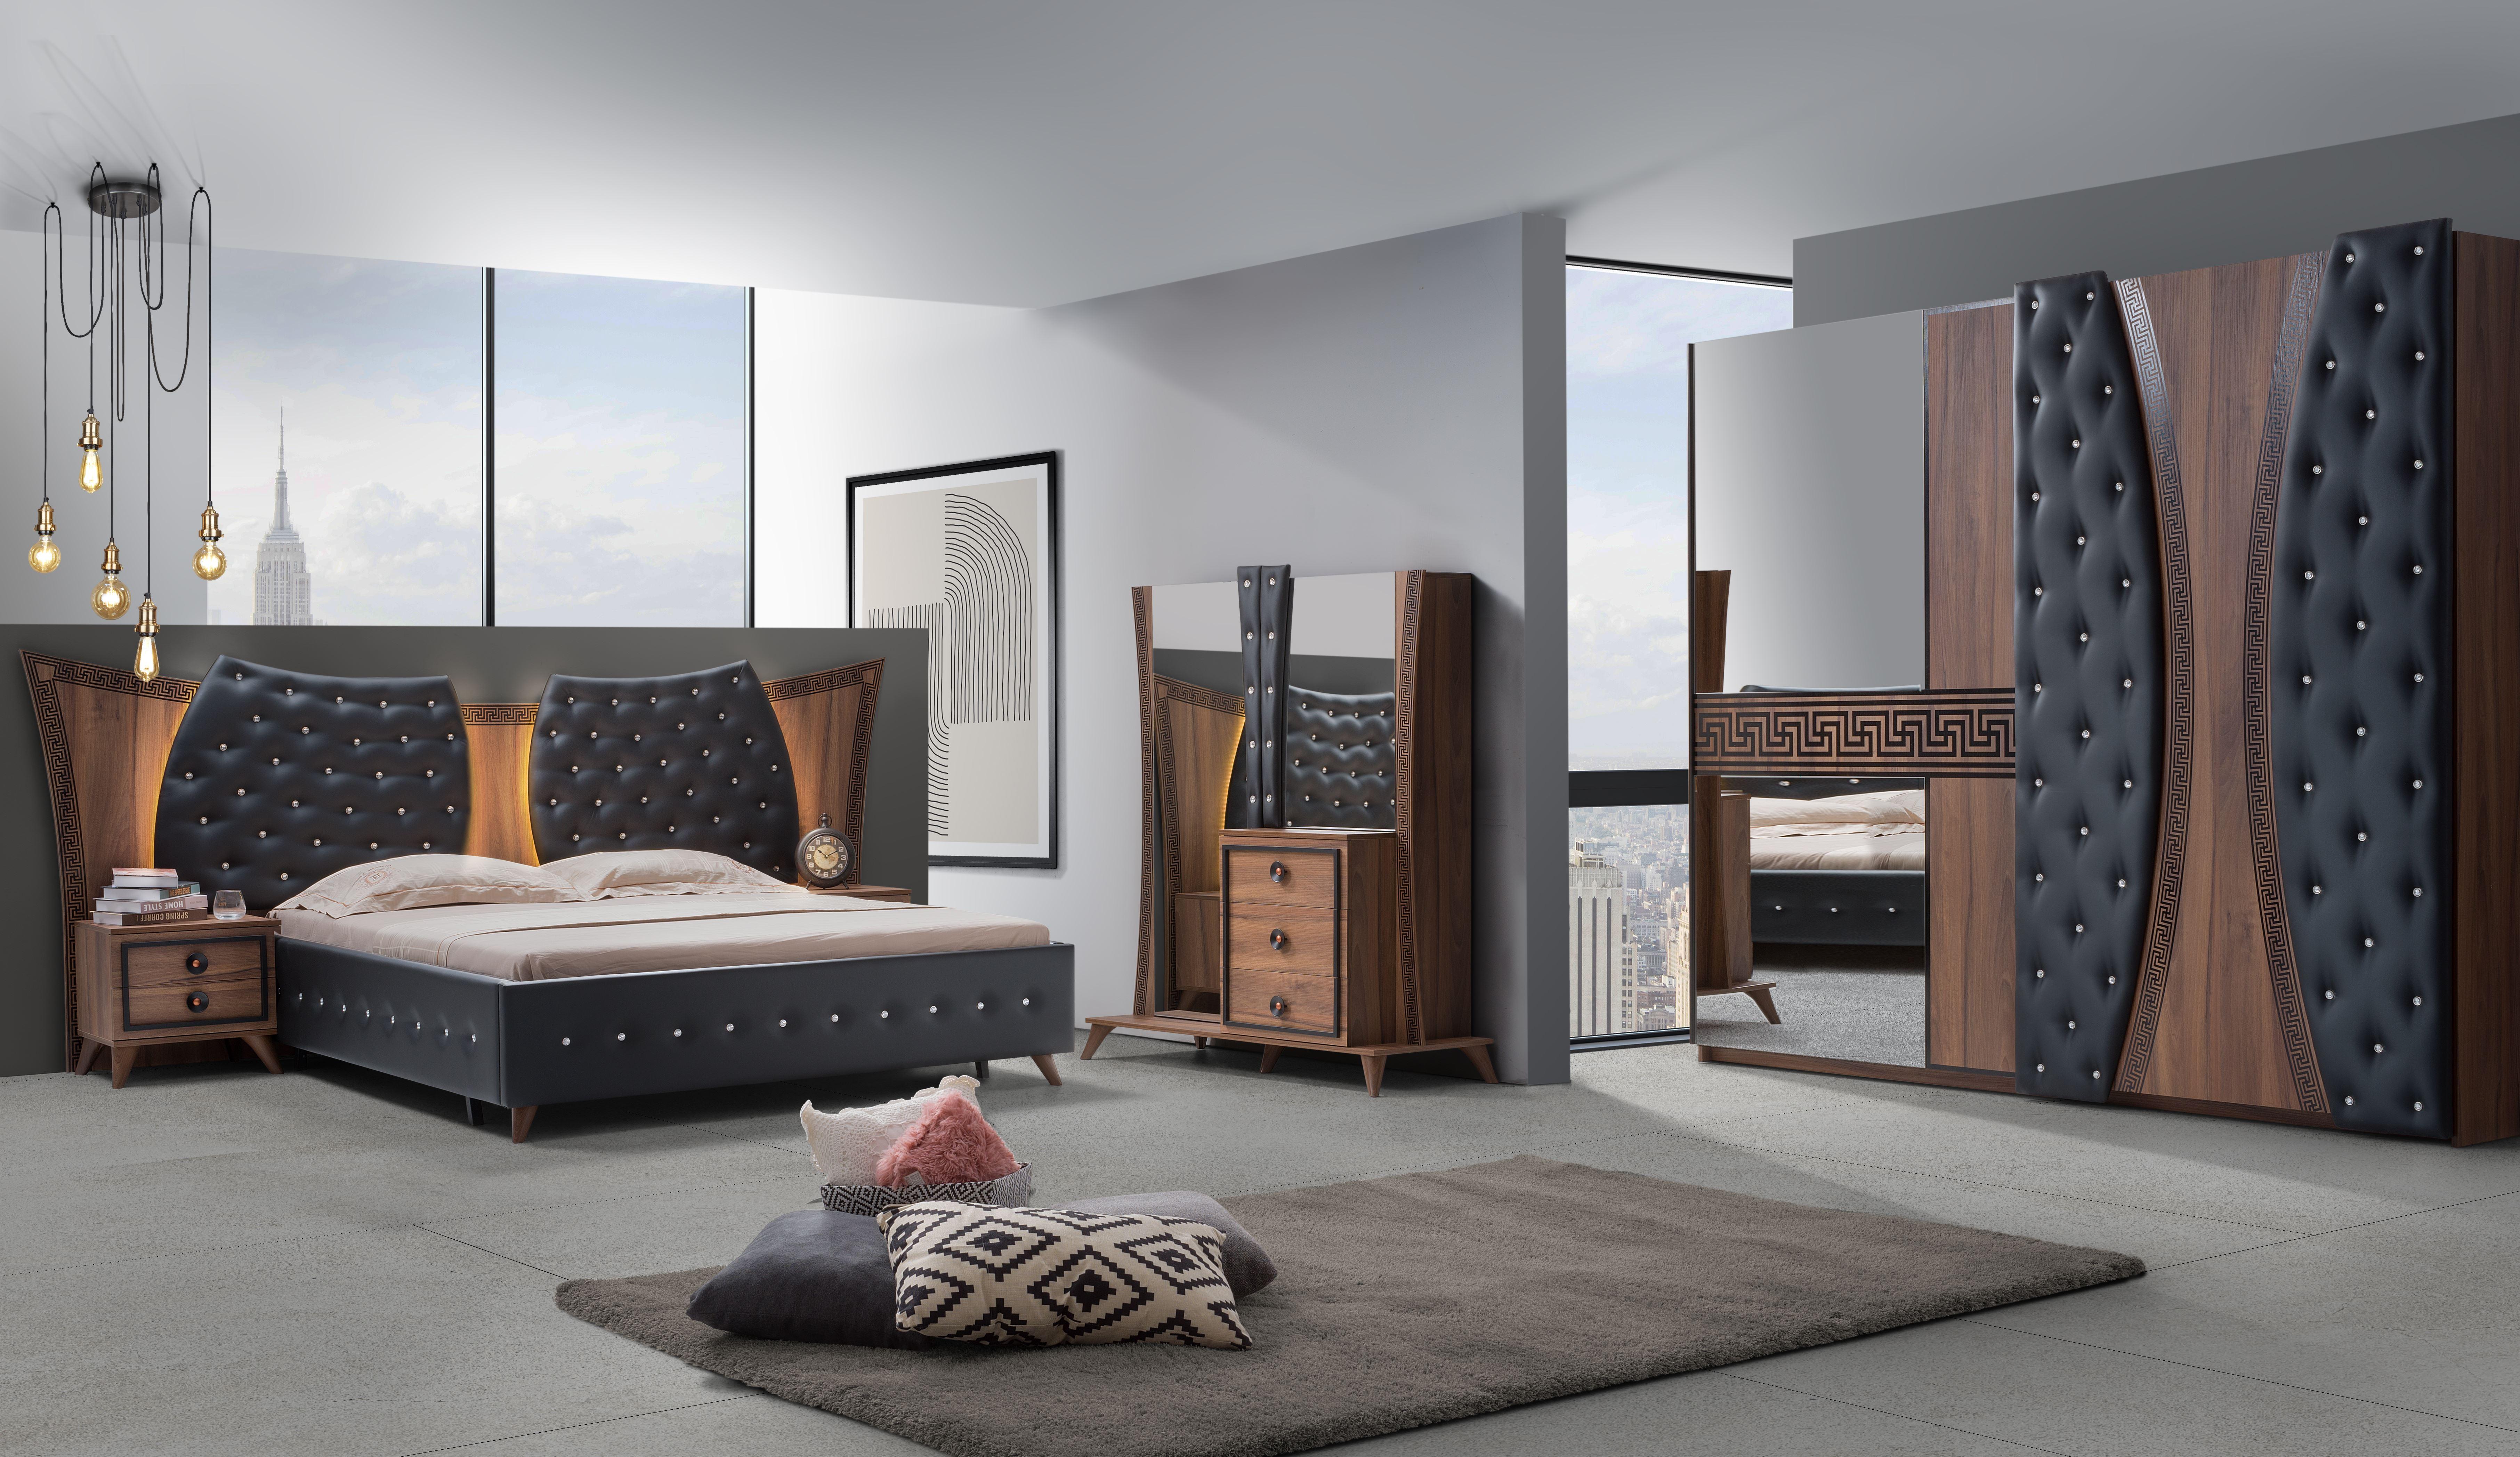 Barock Schlafzimmer Delia in Nussfarben 5-Teilig